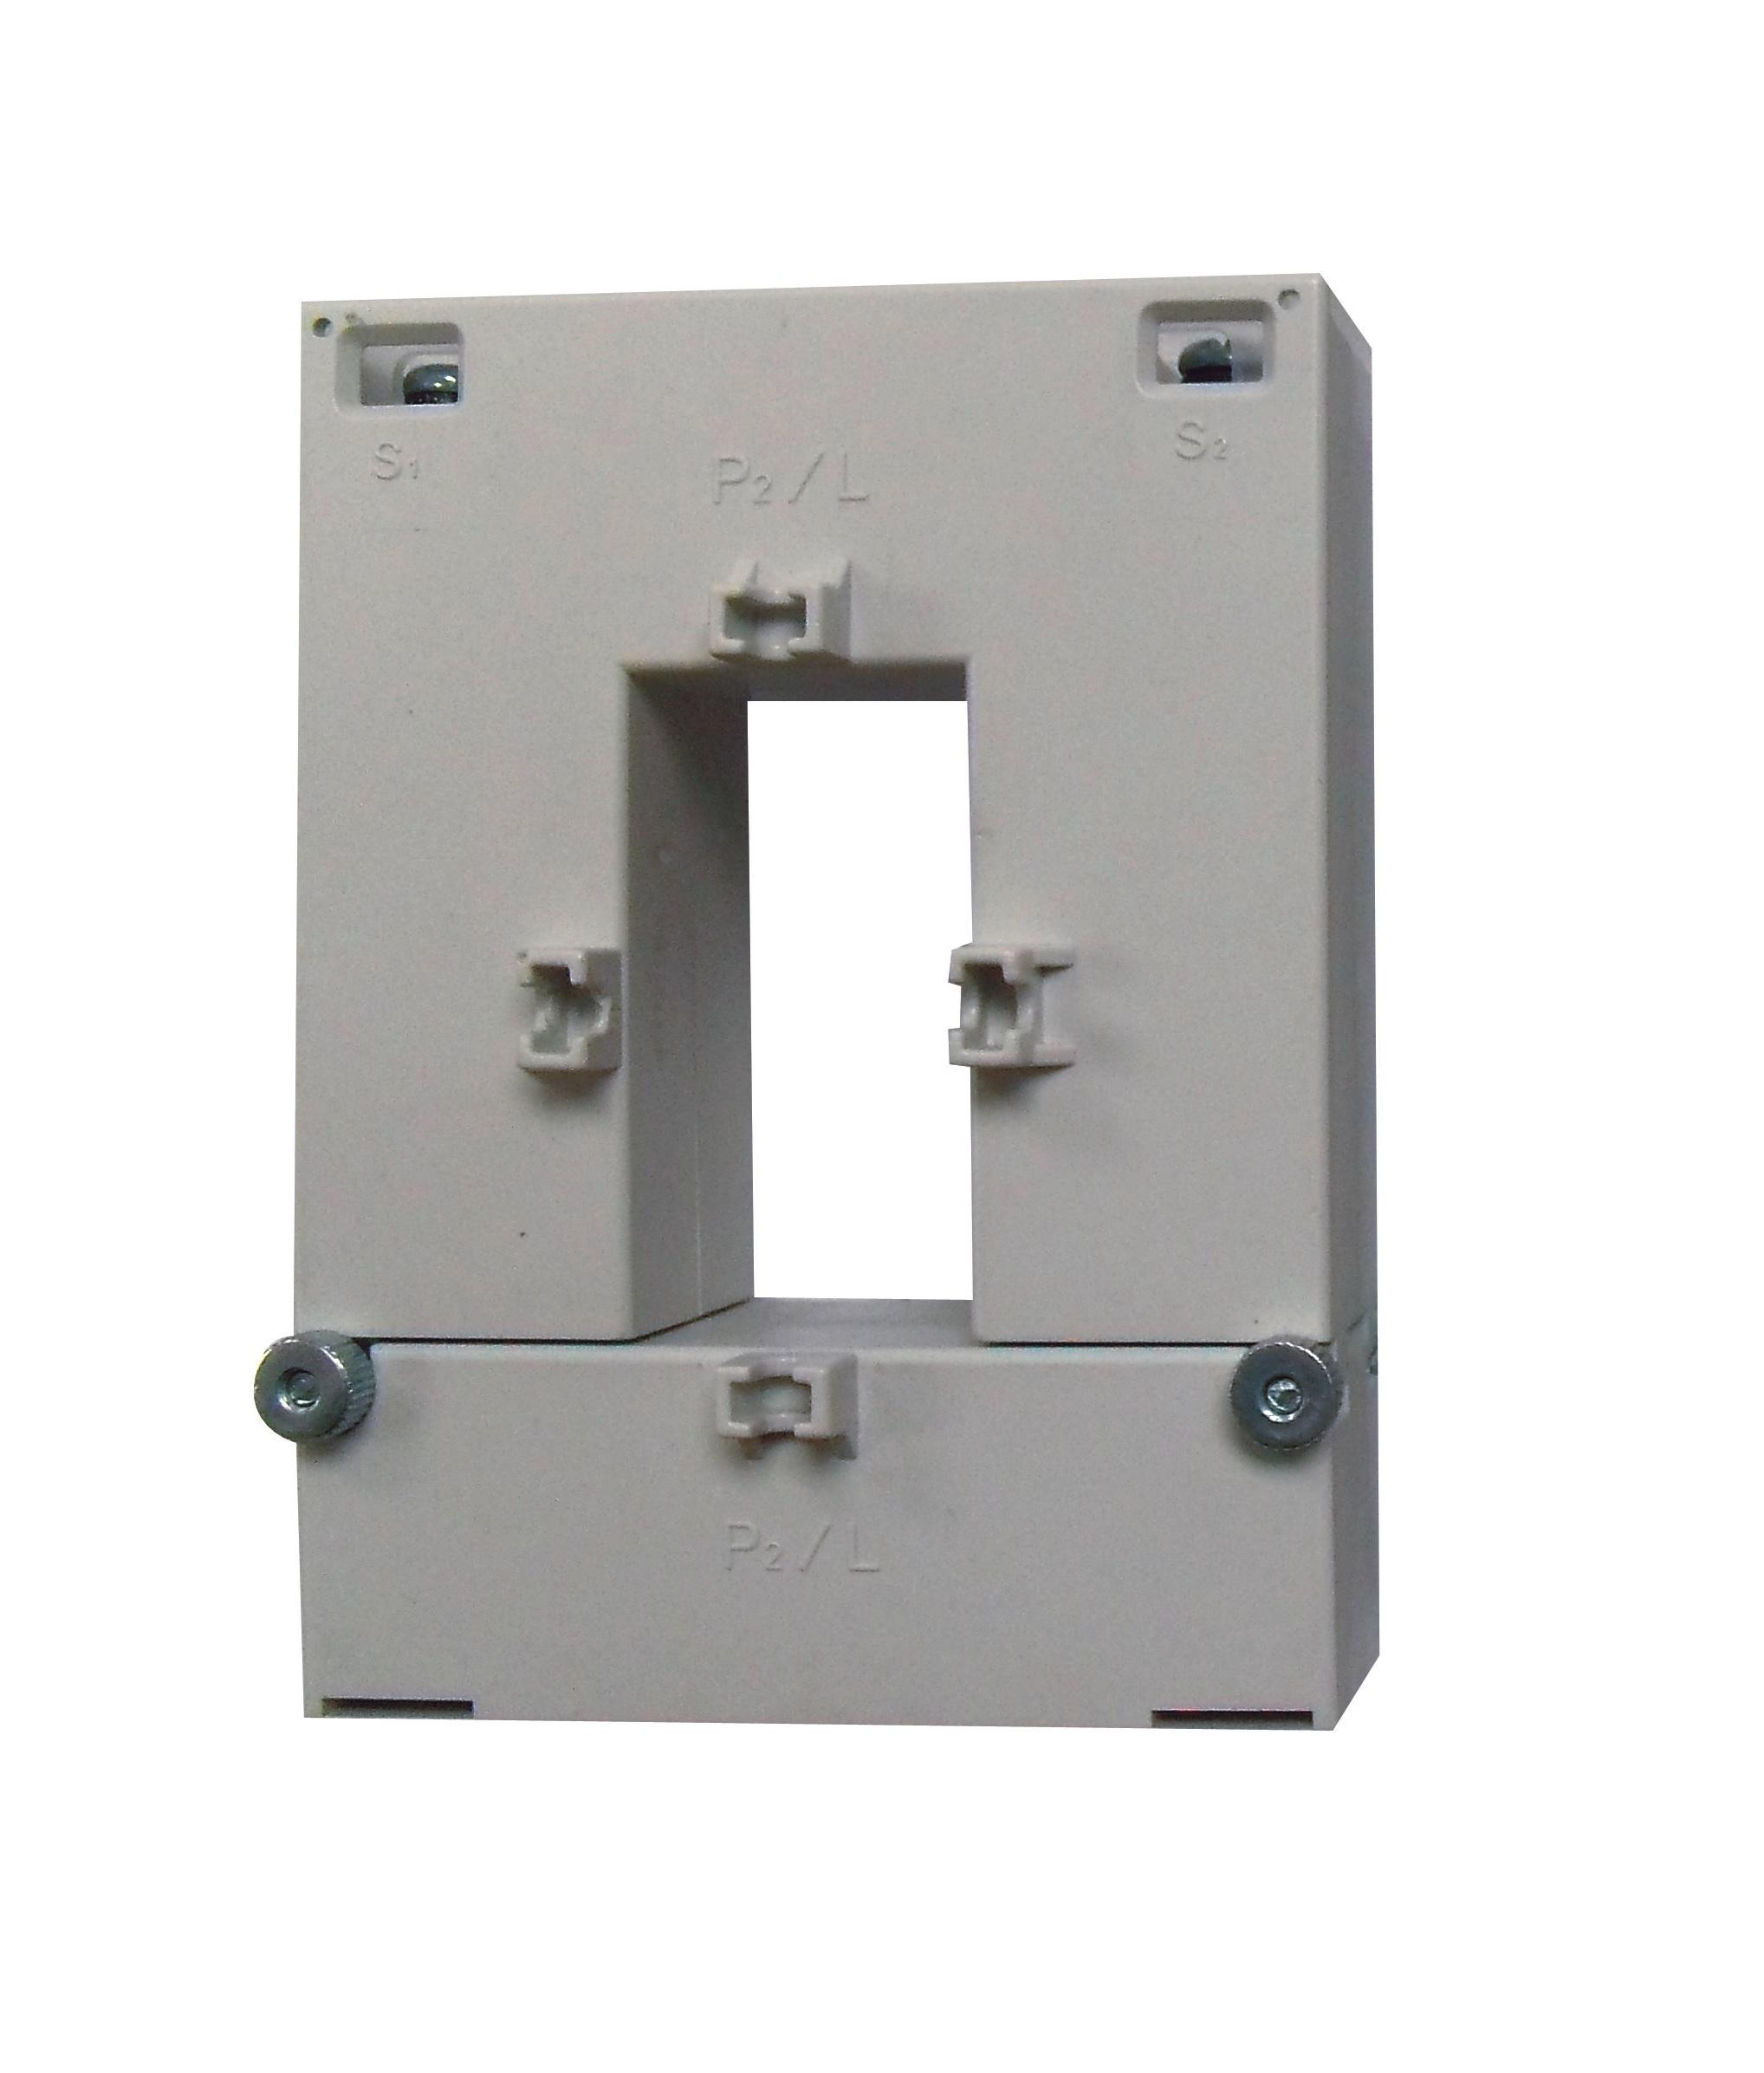 1 Stk Teilbare Wandler, 600/5A, 60x20mm, Klasse 0,5 MG968600--